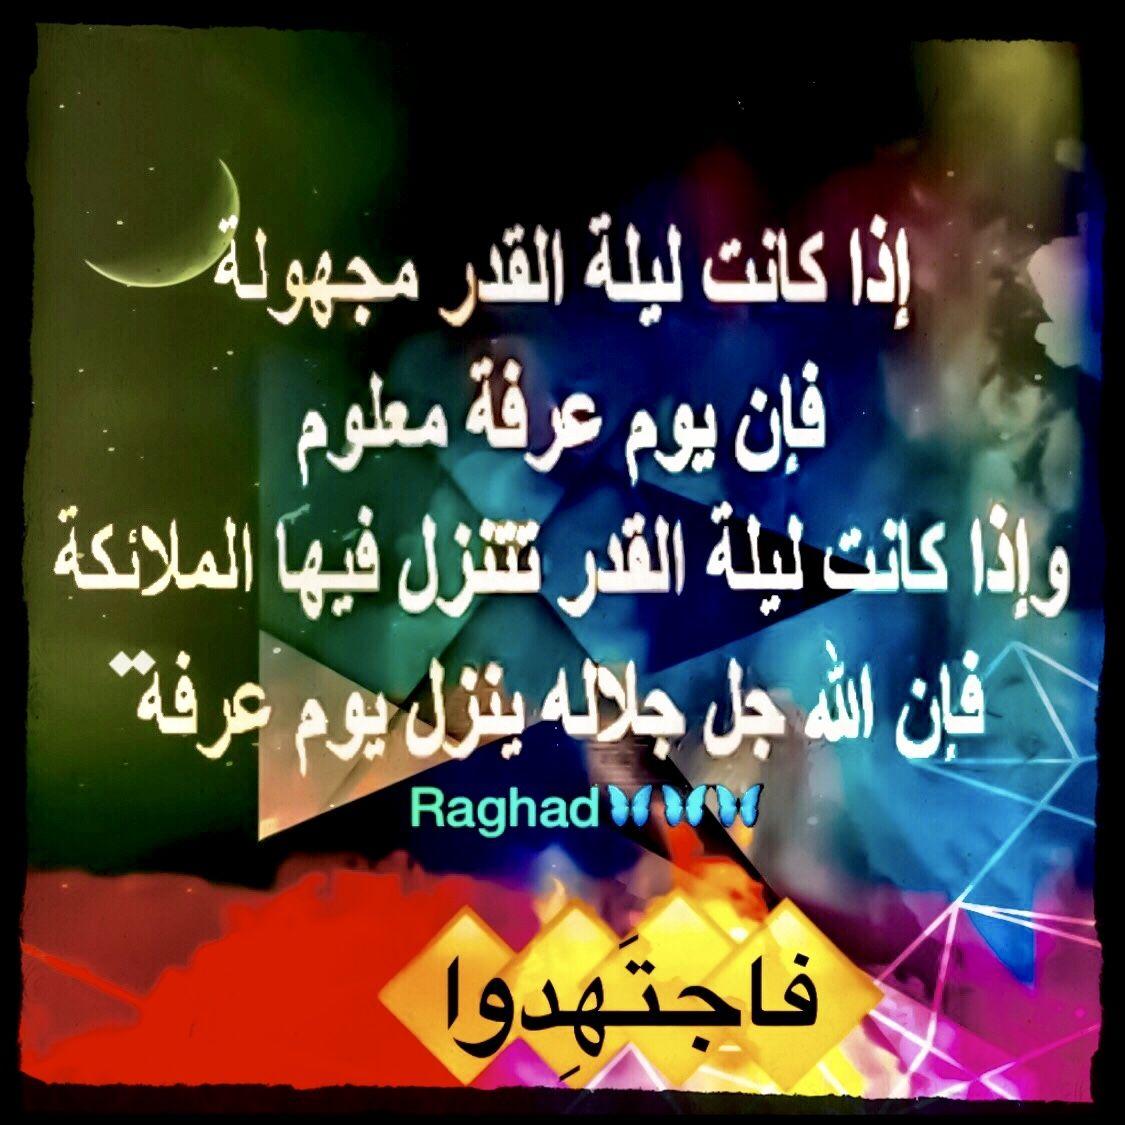 Desertroseروي عن النبي صلى الله عليه وسلم أنه قال خير